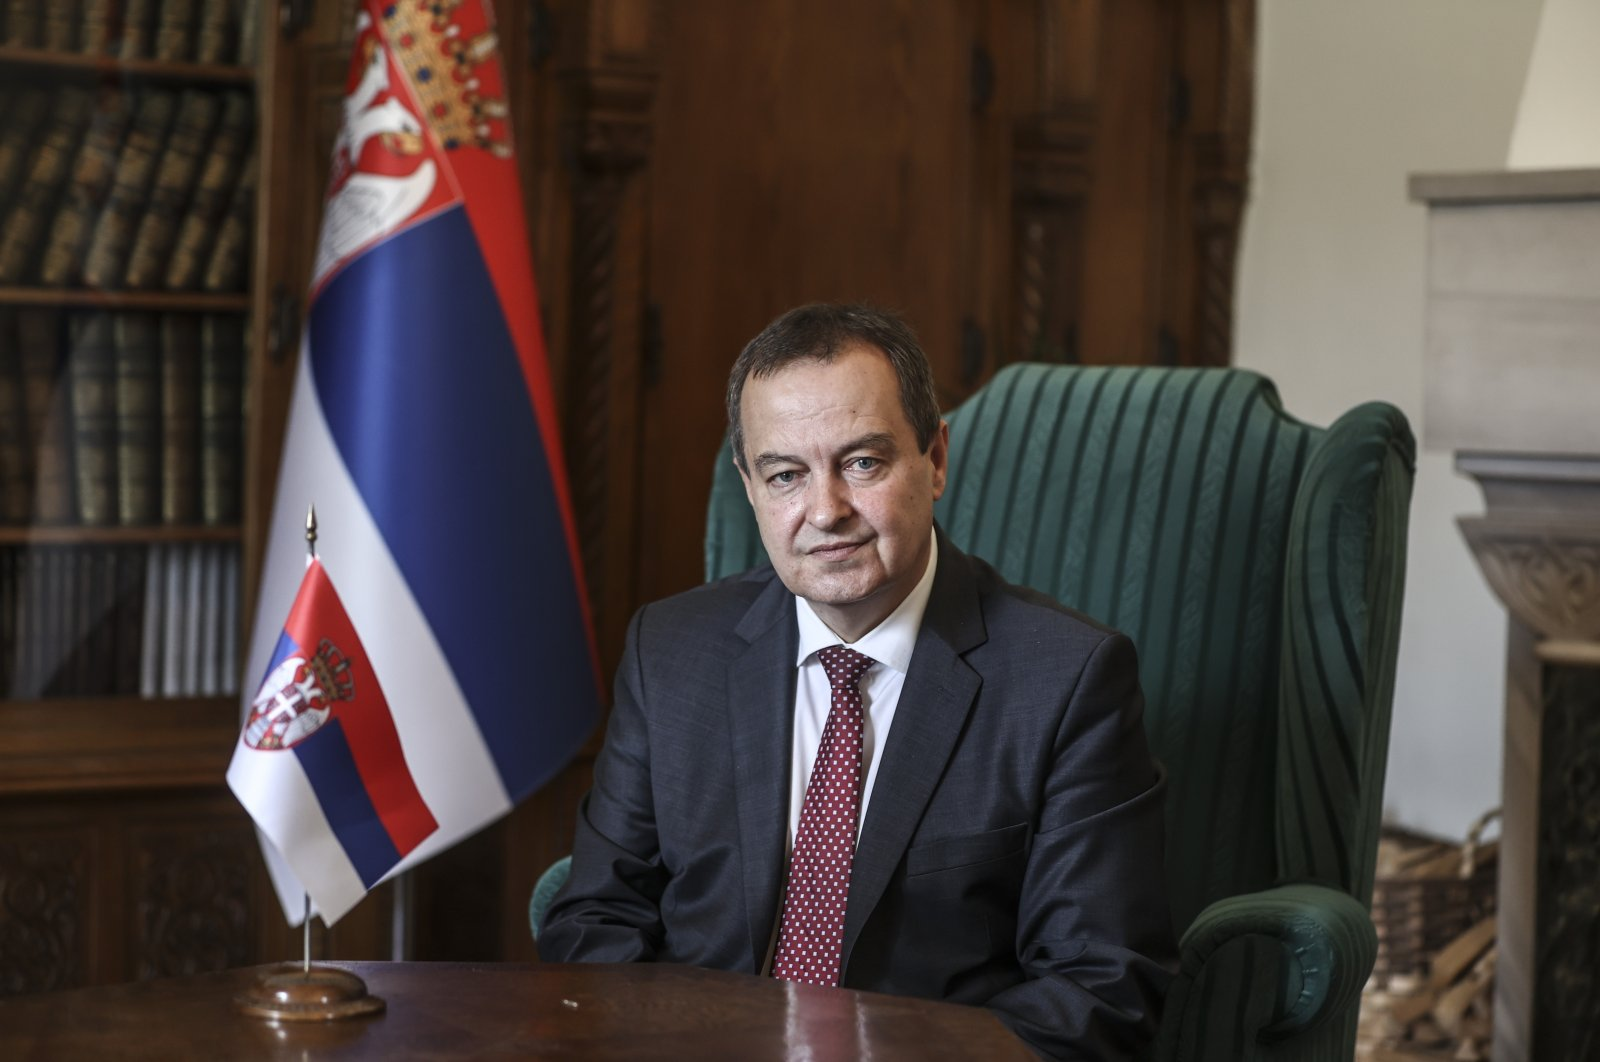 Serbian Parliament Speaker Ivica Dacic speaks to Anadolu Agency (AA) in Ankara, Turkey, Sept. 15, 2021. (AA Photo)